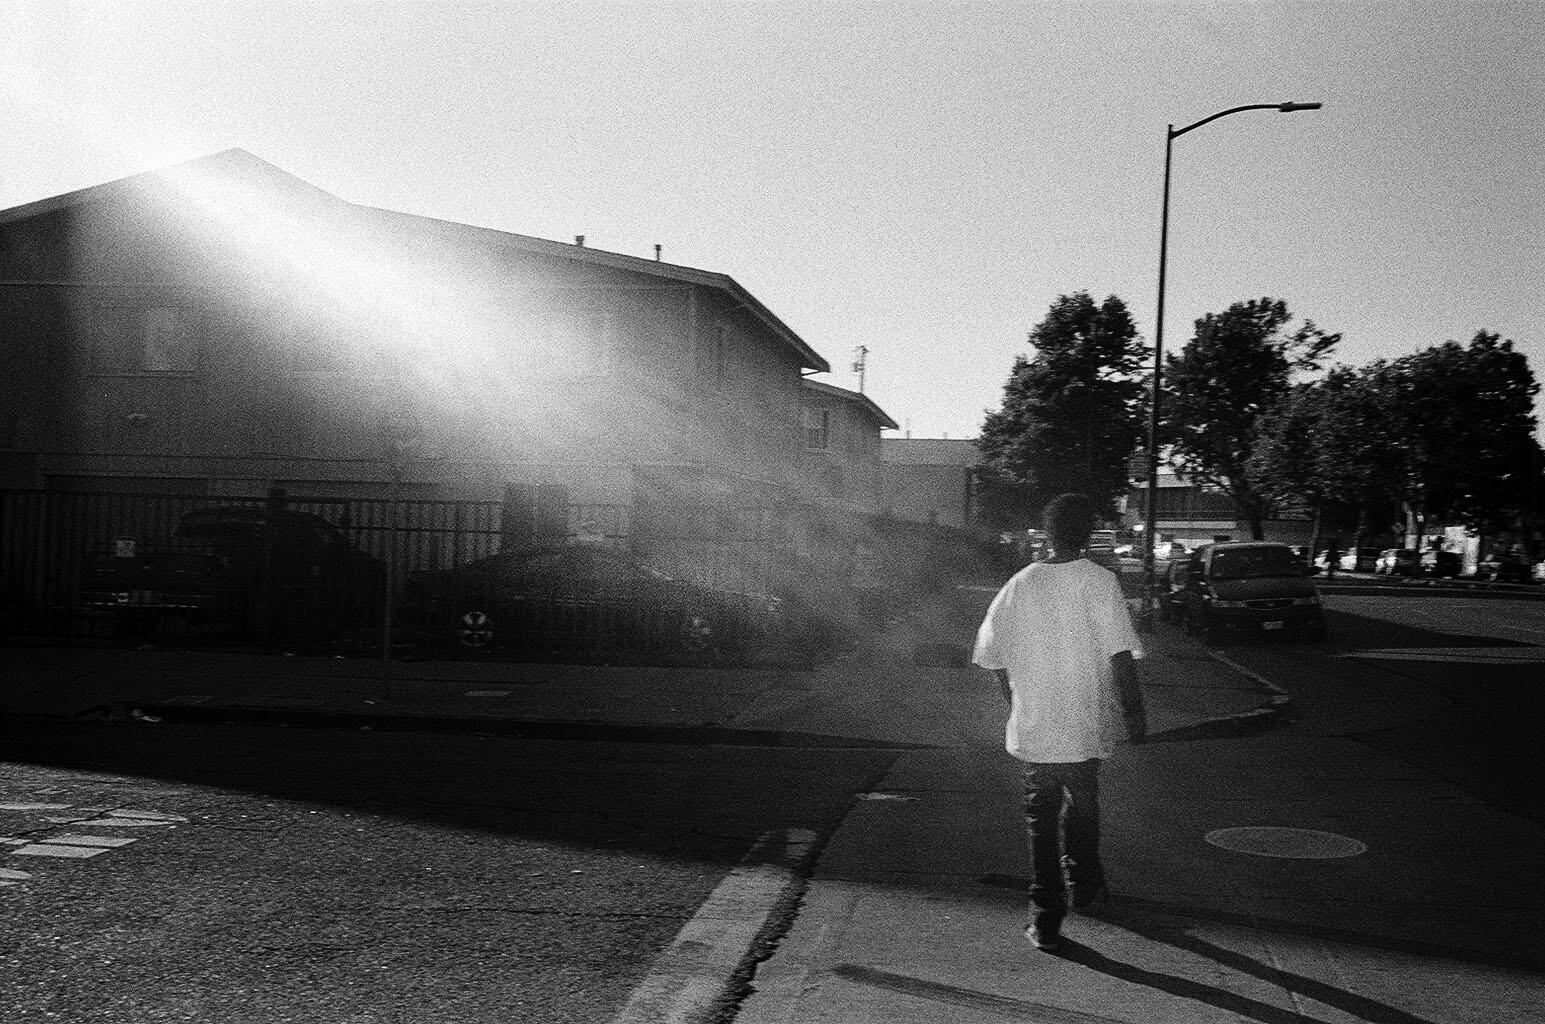 light_man_walking.jpg